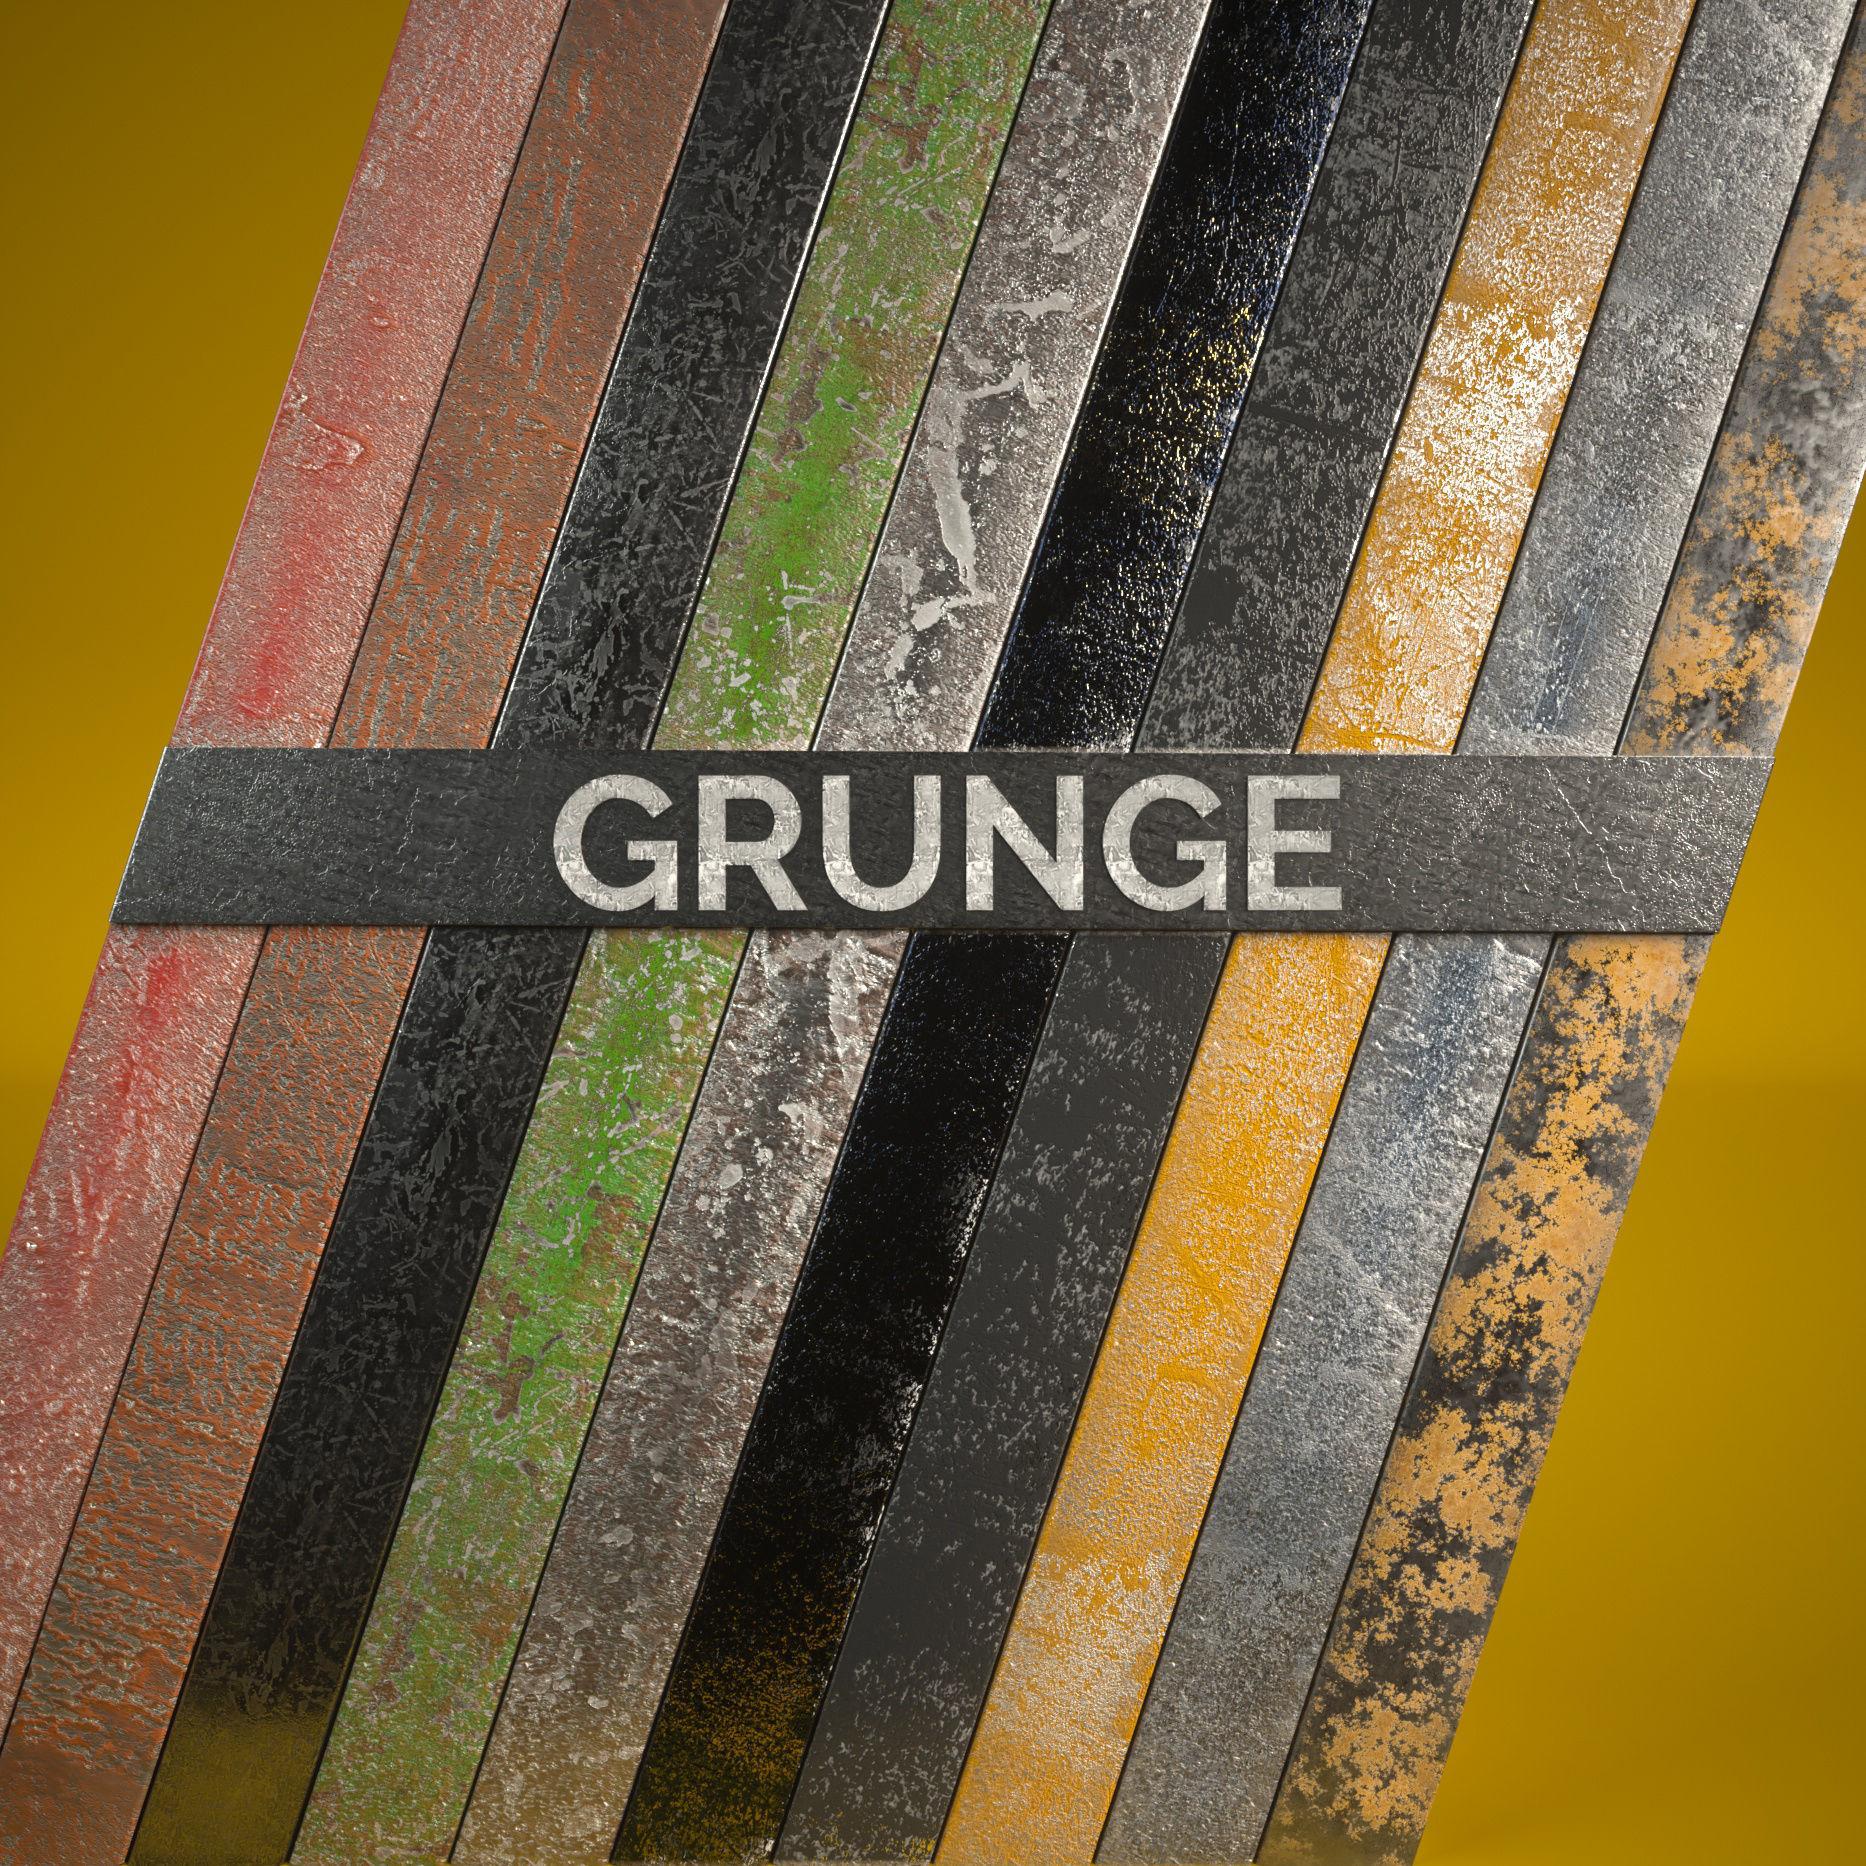 10 Grunge Metal Materials for C4D Octane Render   Texture